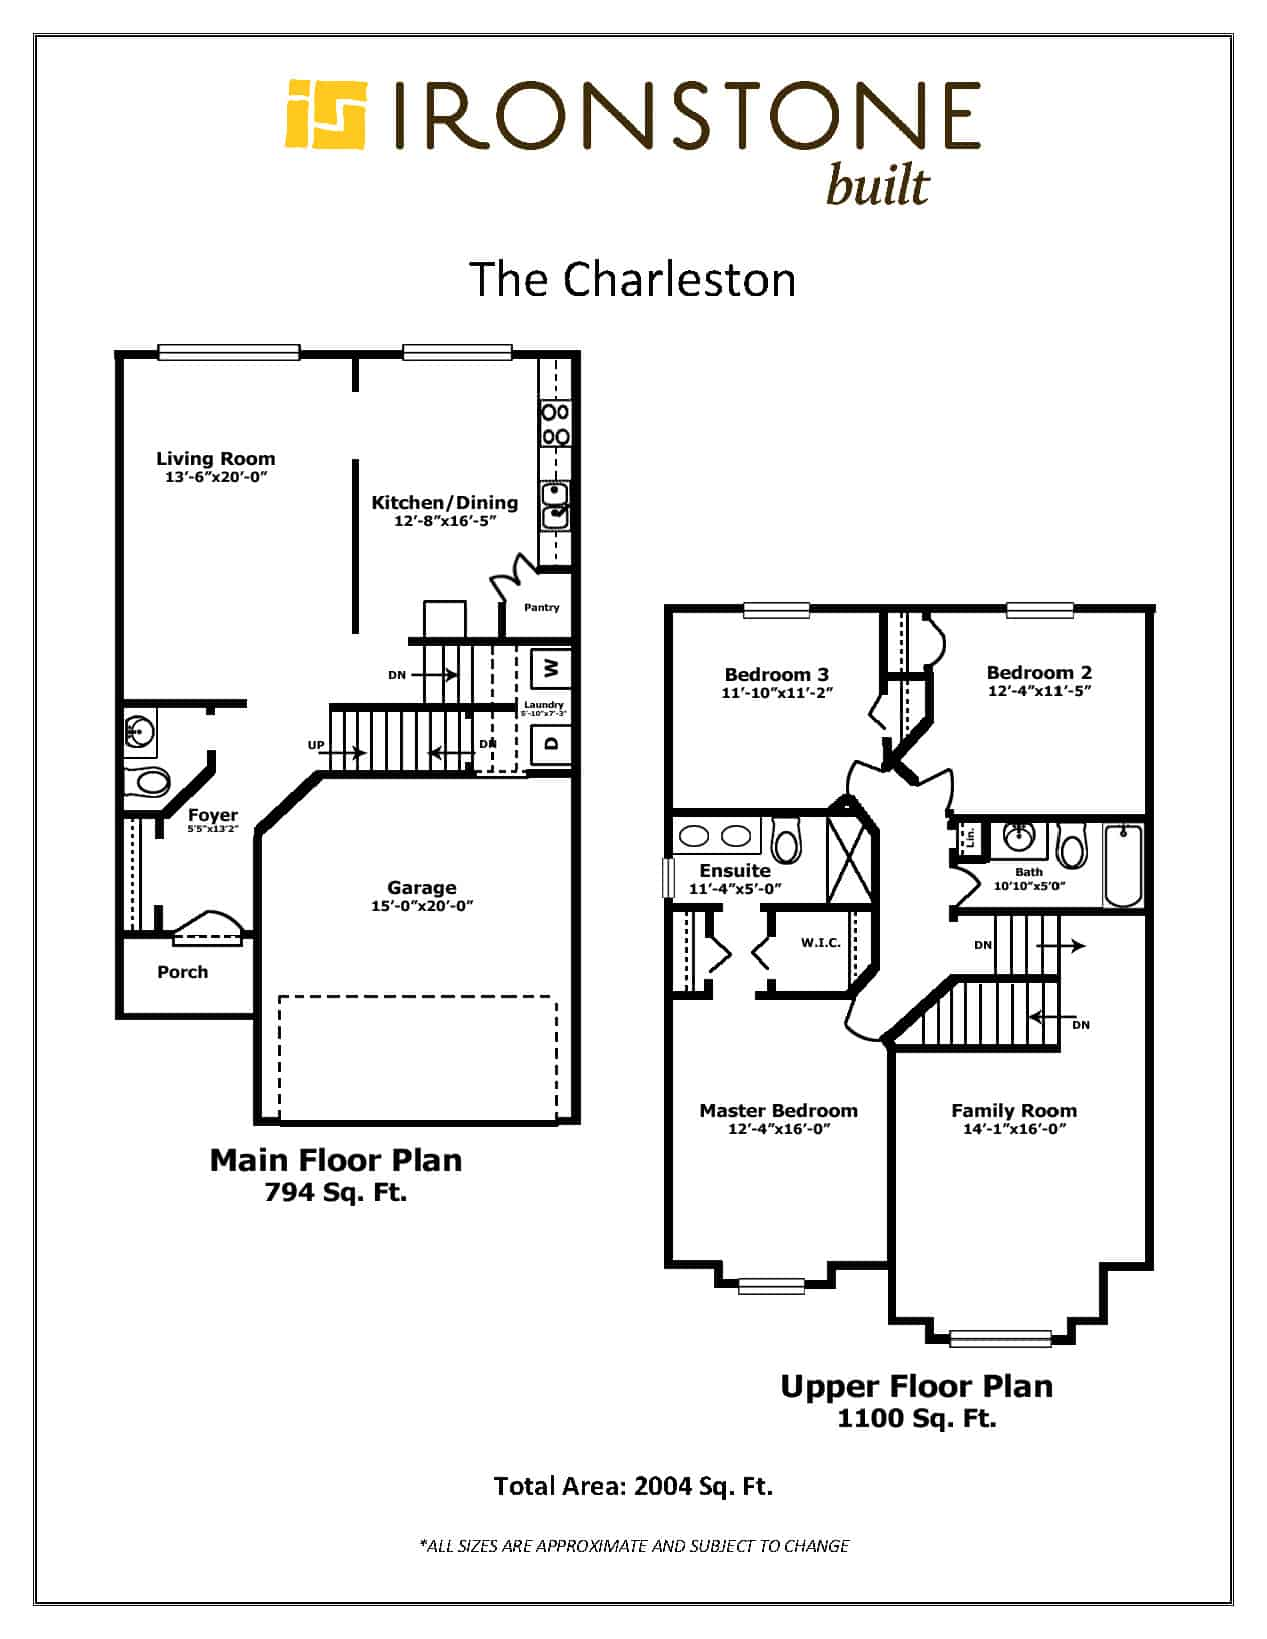 Image of Charleston Floor Plan